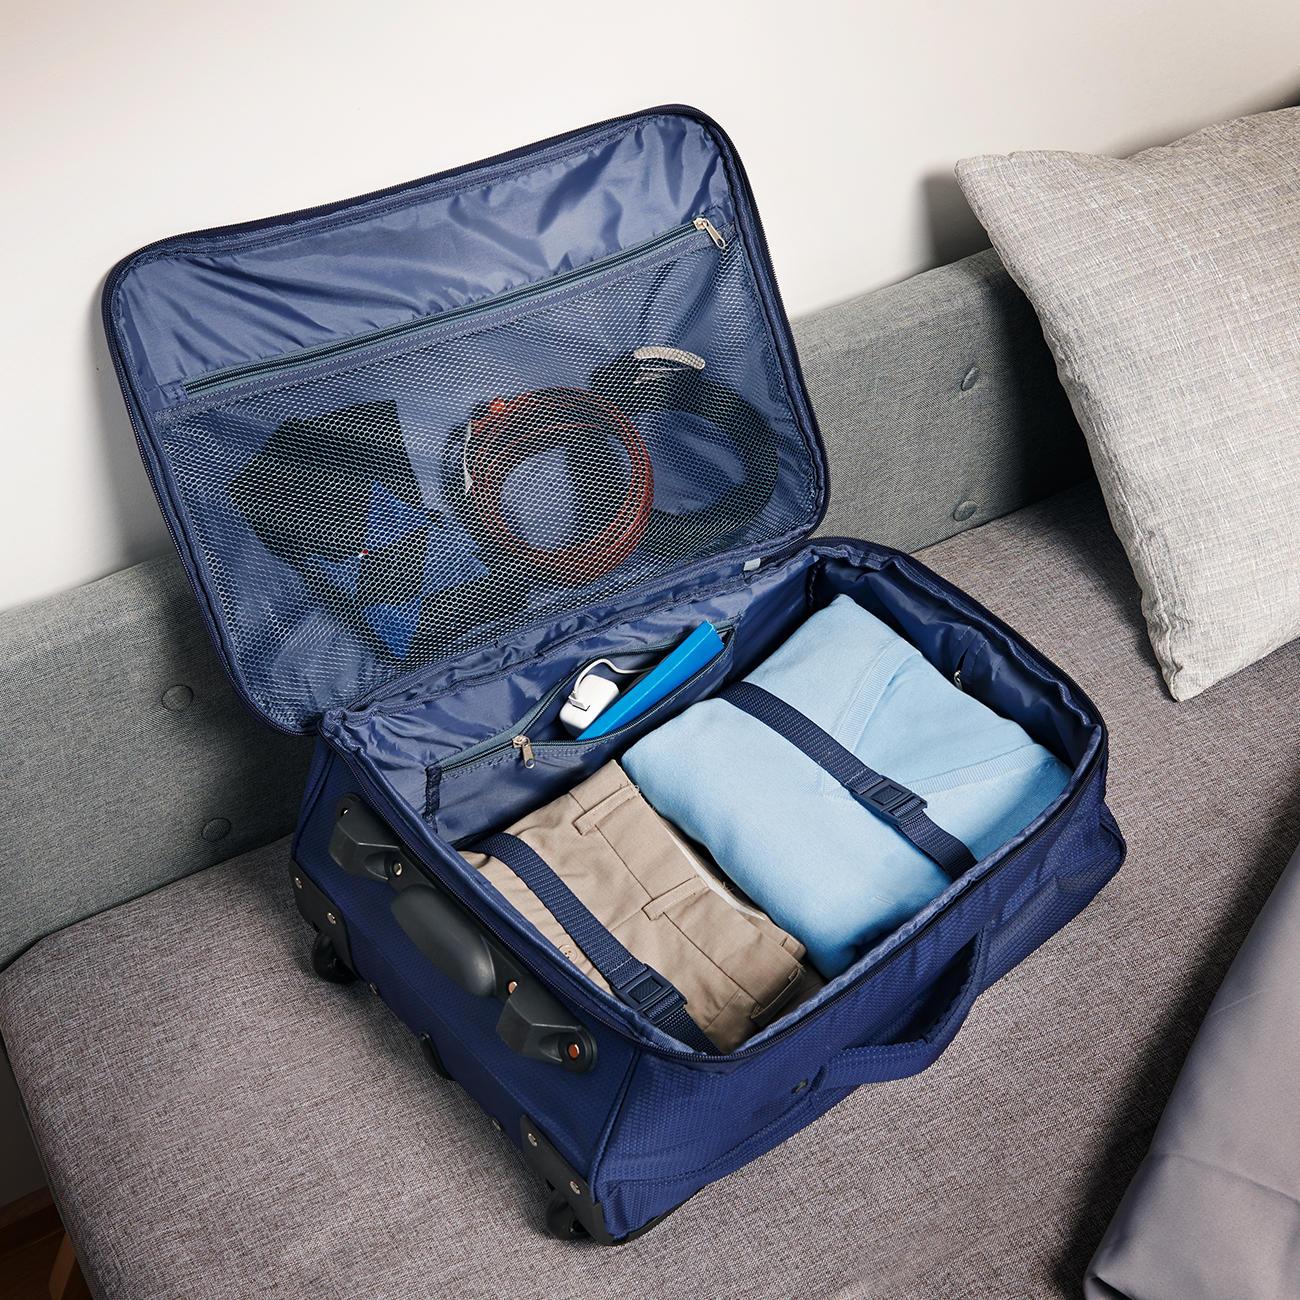 oconi falt trolley 3 jahre garantie pro idee. Black Bedroom Furniture Sets. Home Design Ideas